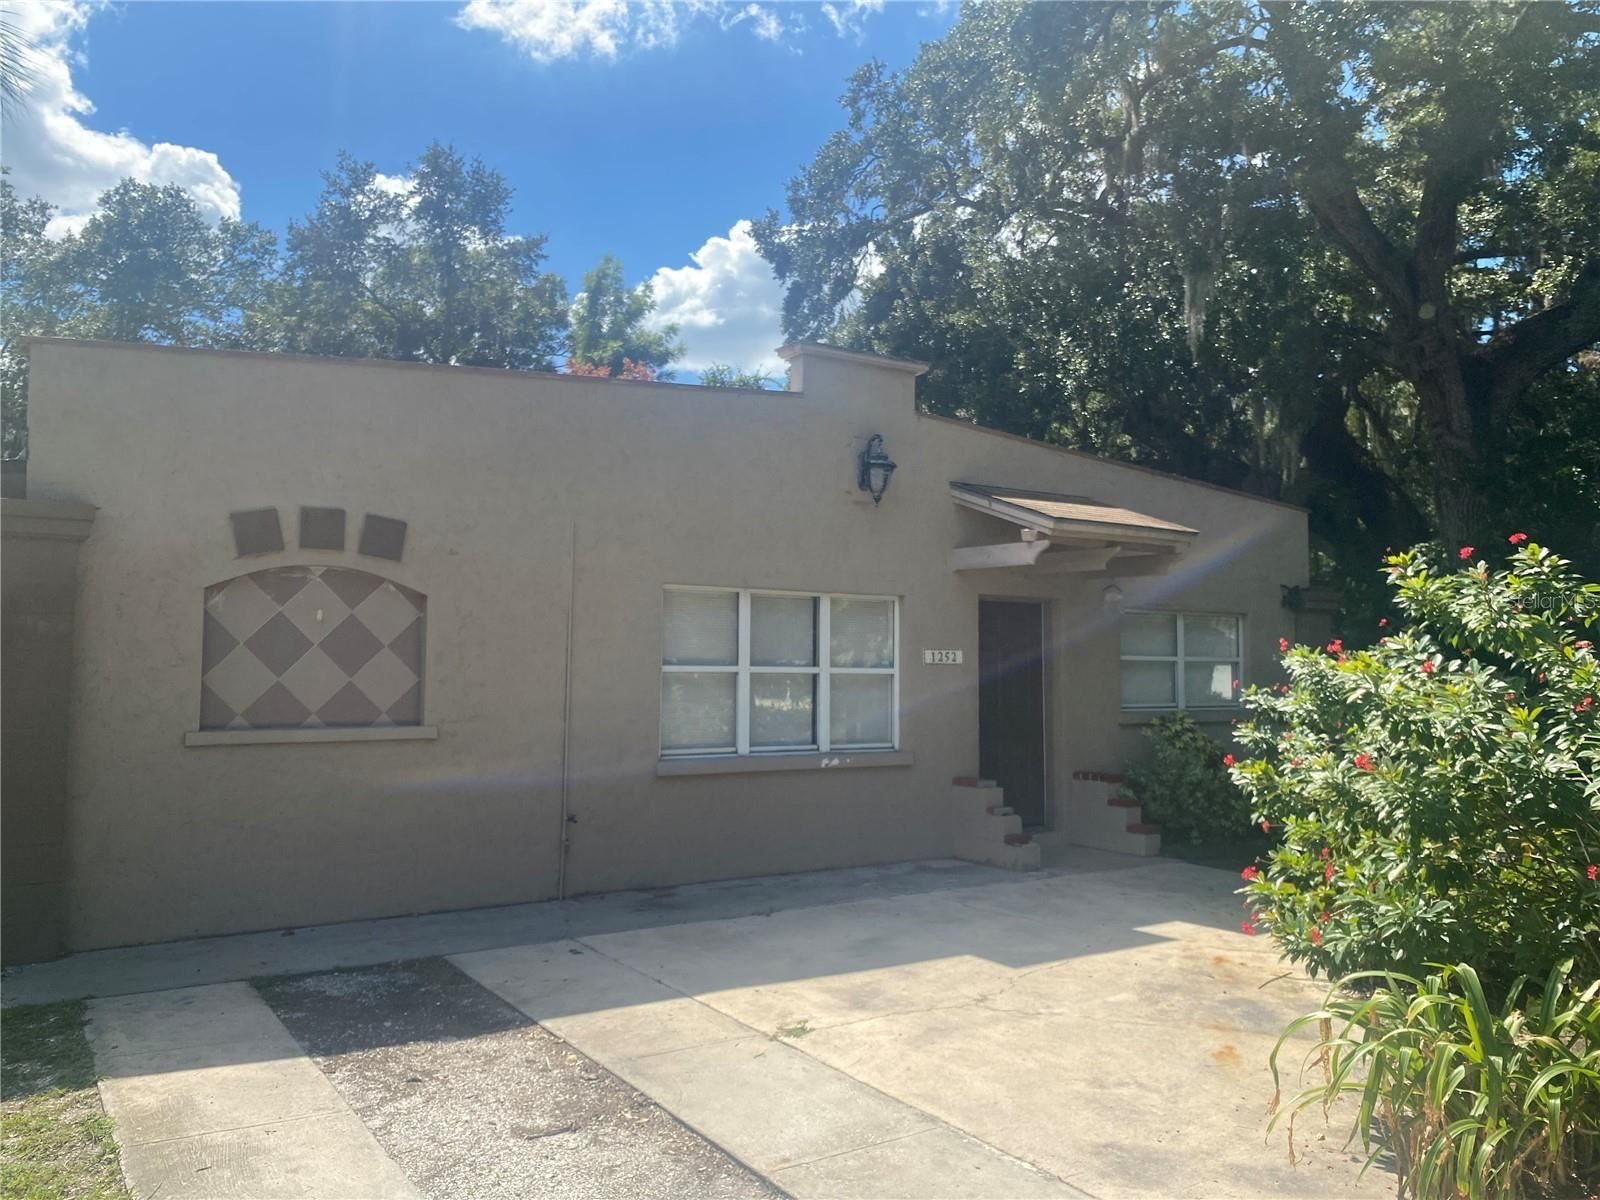 Photo of 1252 HIGHLAND STREET, SARASOTA, FL 34234 (MLS # A4514786)